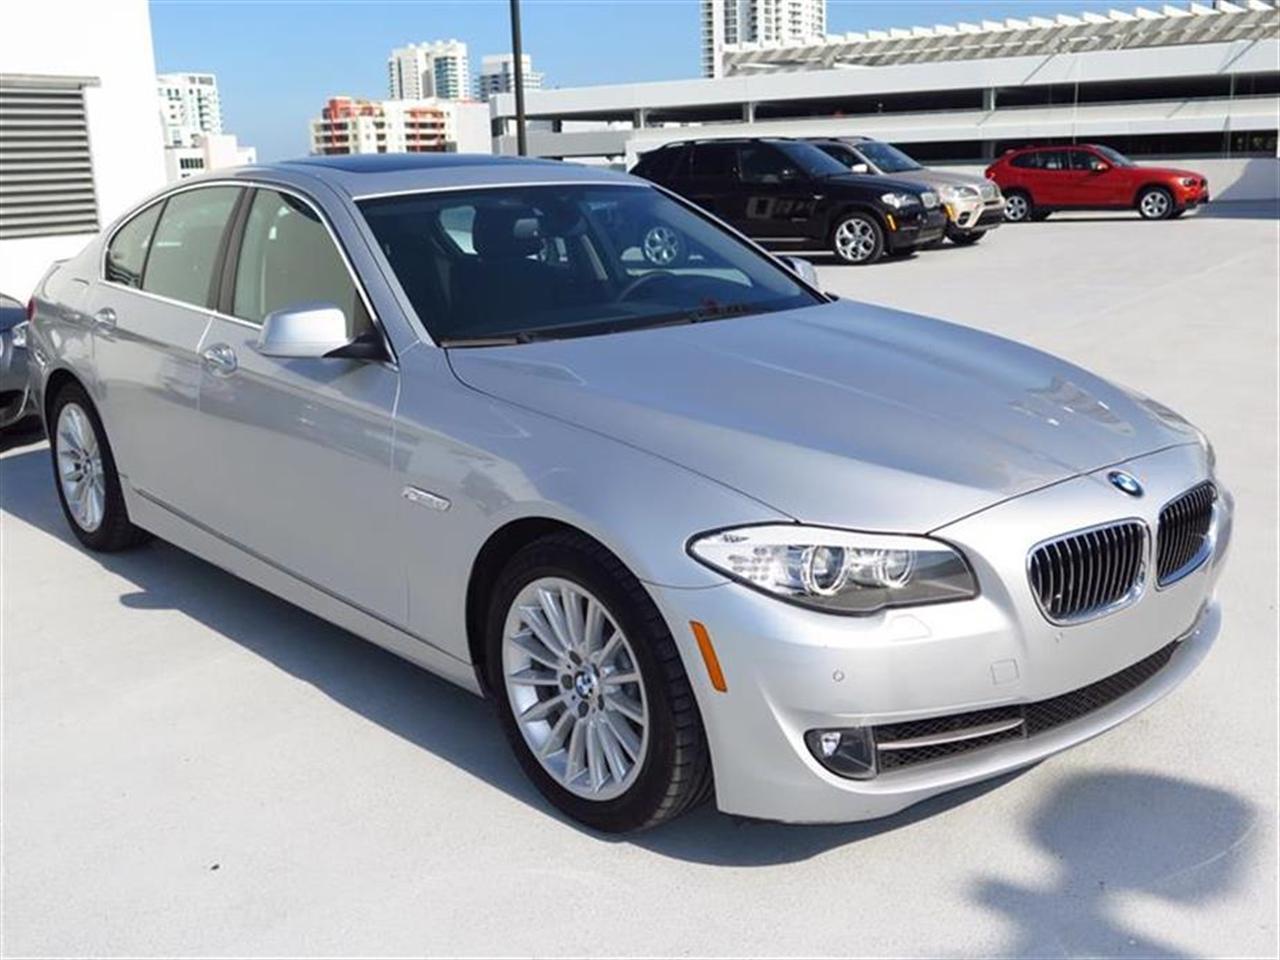 2013 BMW 5 SERIES 4dr Sdn 535i RWD 27913 miles 10-way power-adjustable front bucket seats -inc 4